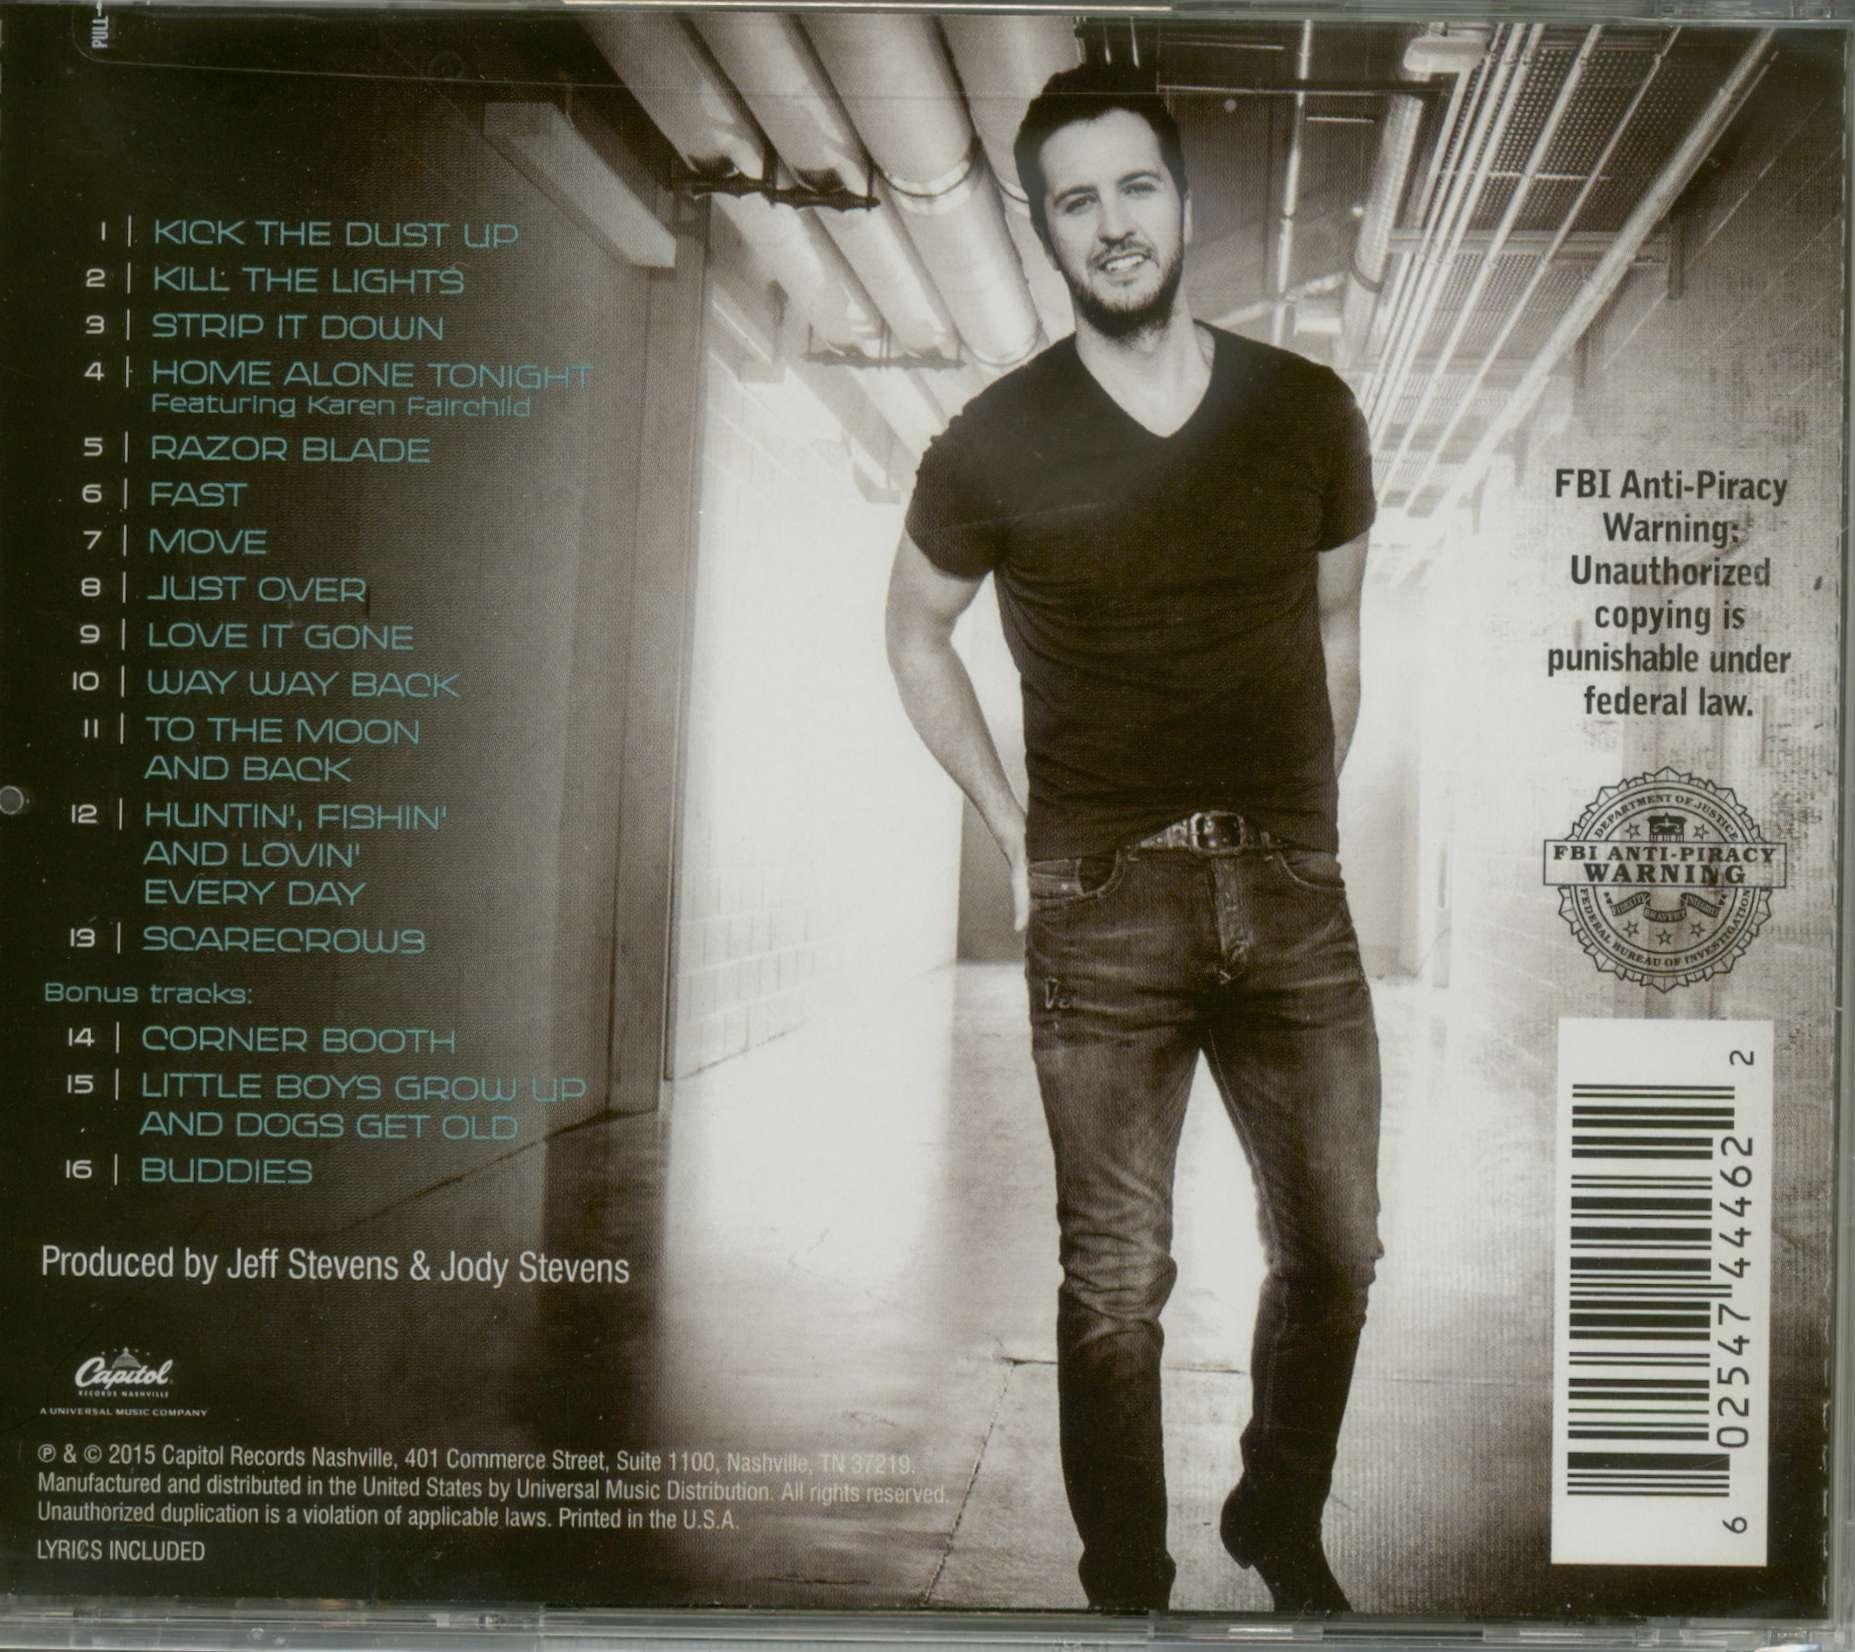 Luke bryan tailgates and tanlines album torrent download